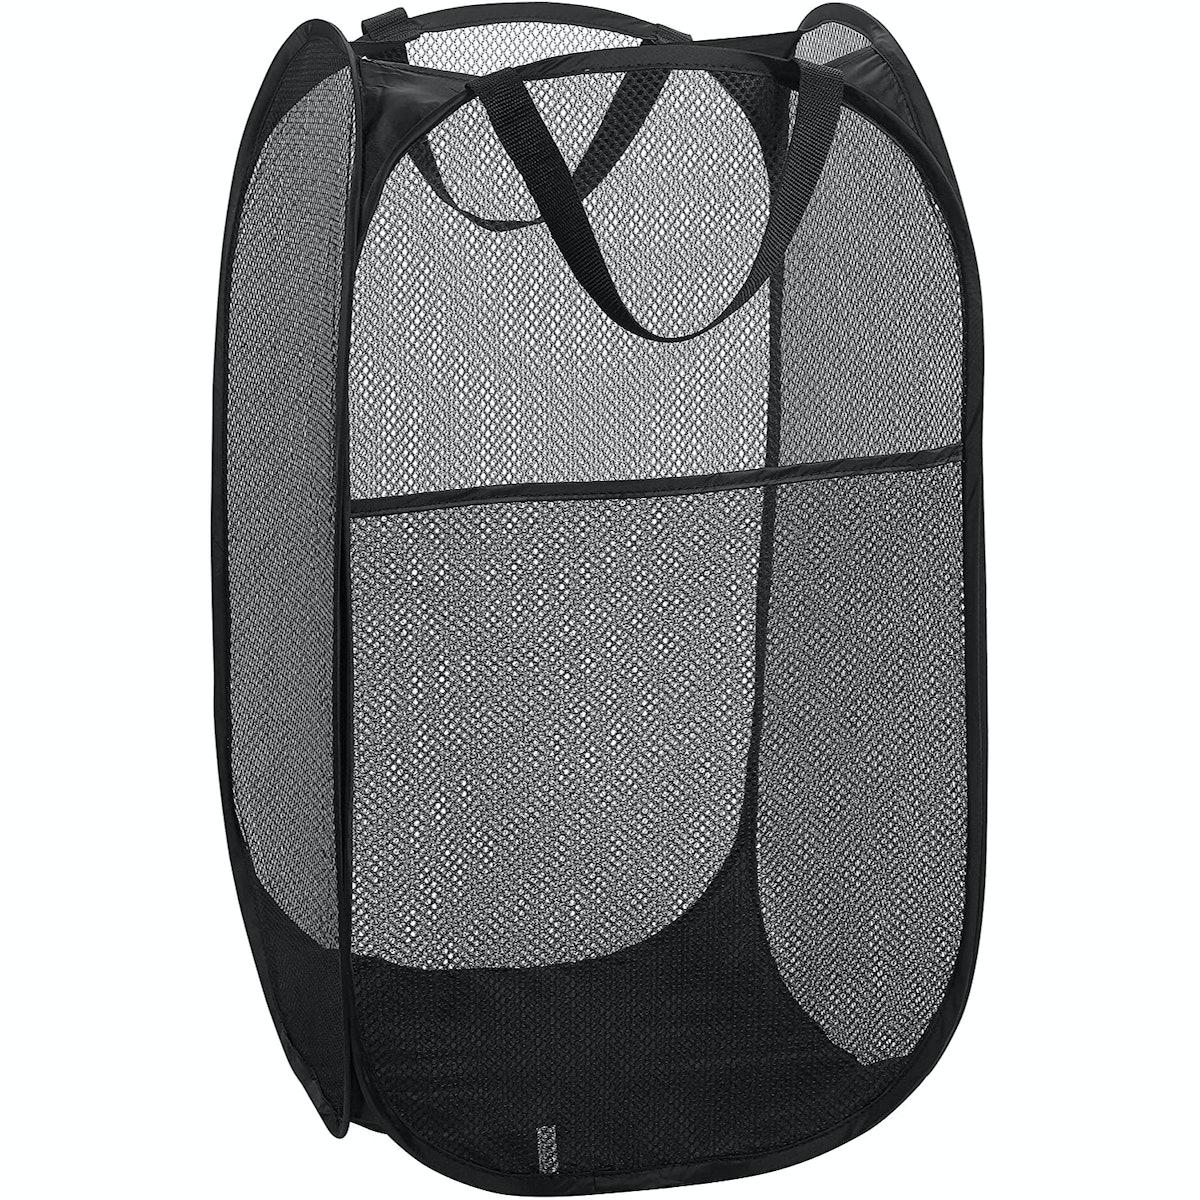 Handy Laundry Mesh Pop-Up Laundry Basket